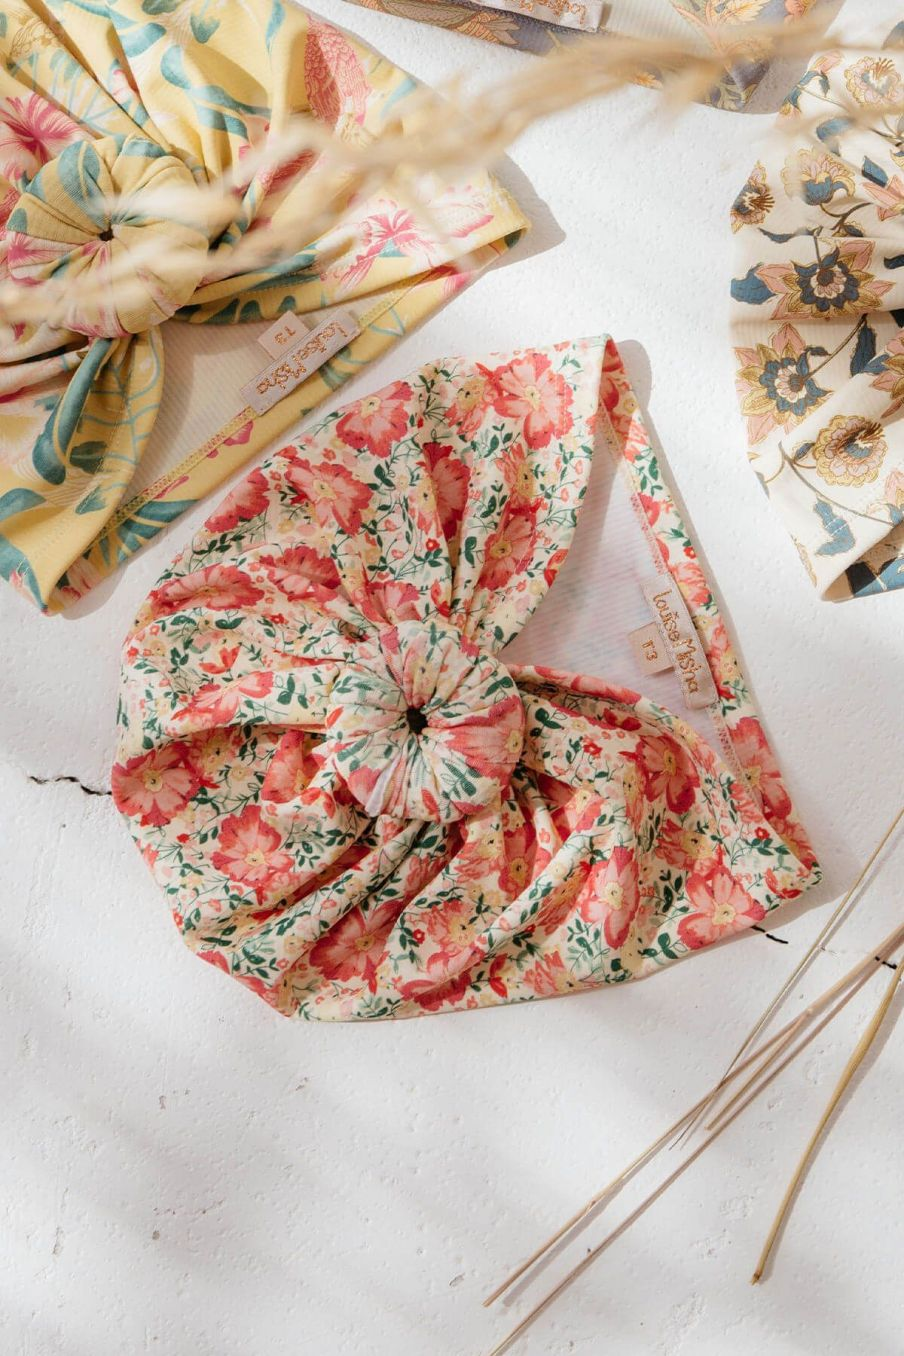 bohemian chic vintage bathing turban girl sylvania pink meadow